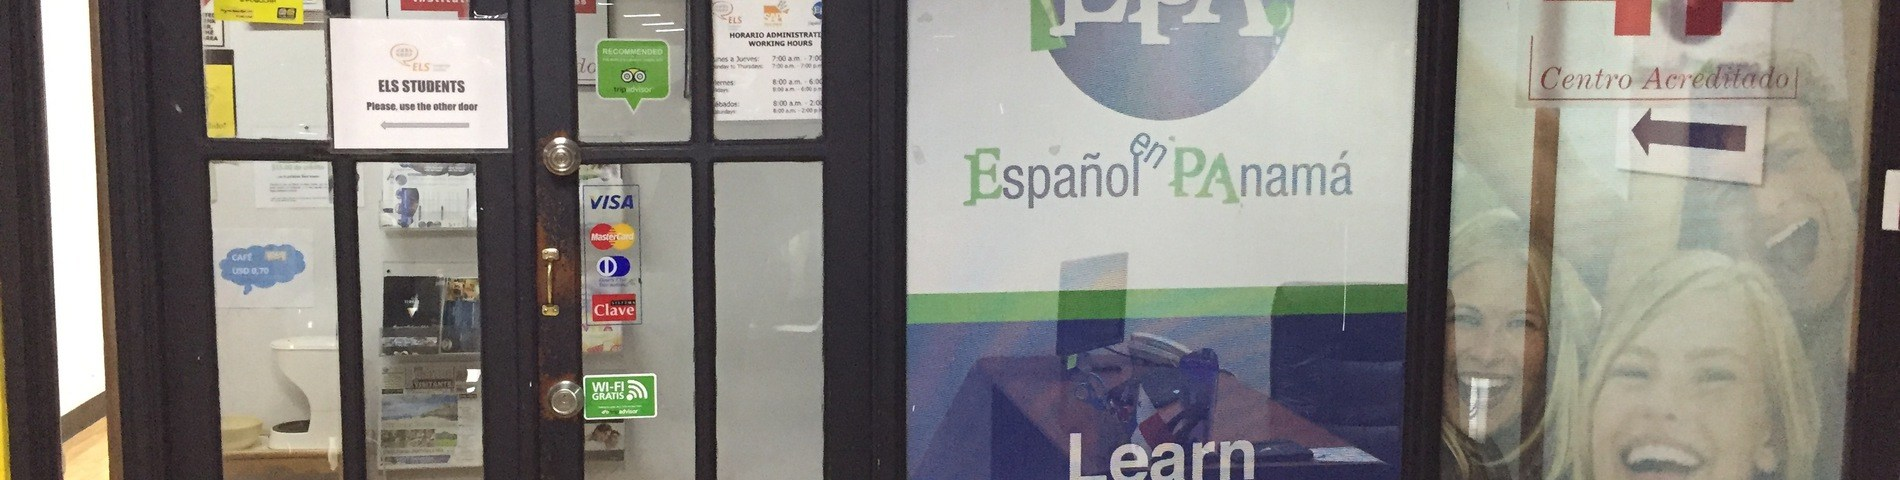 EPA! Español en Panamá obrazek 1